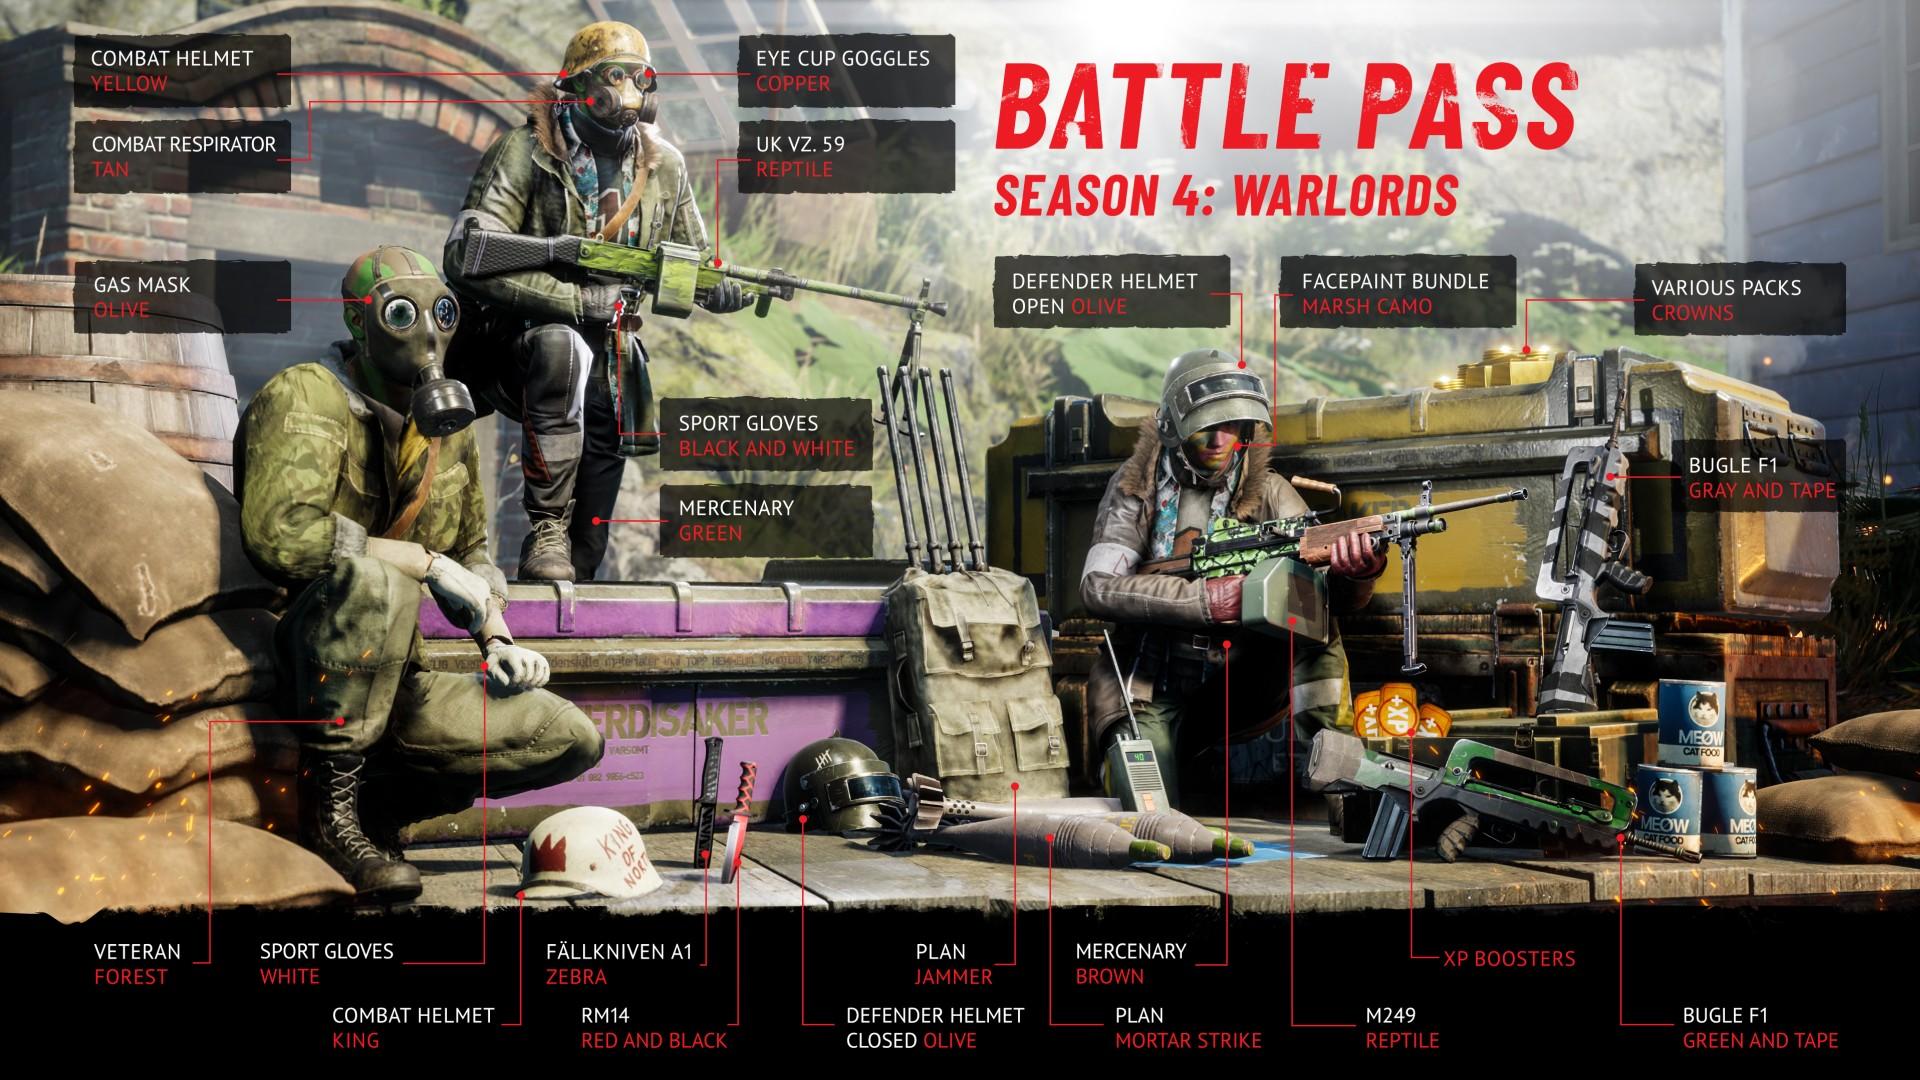 Vigor - Season 4: Warlords